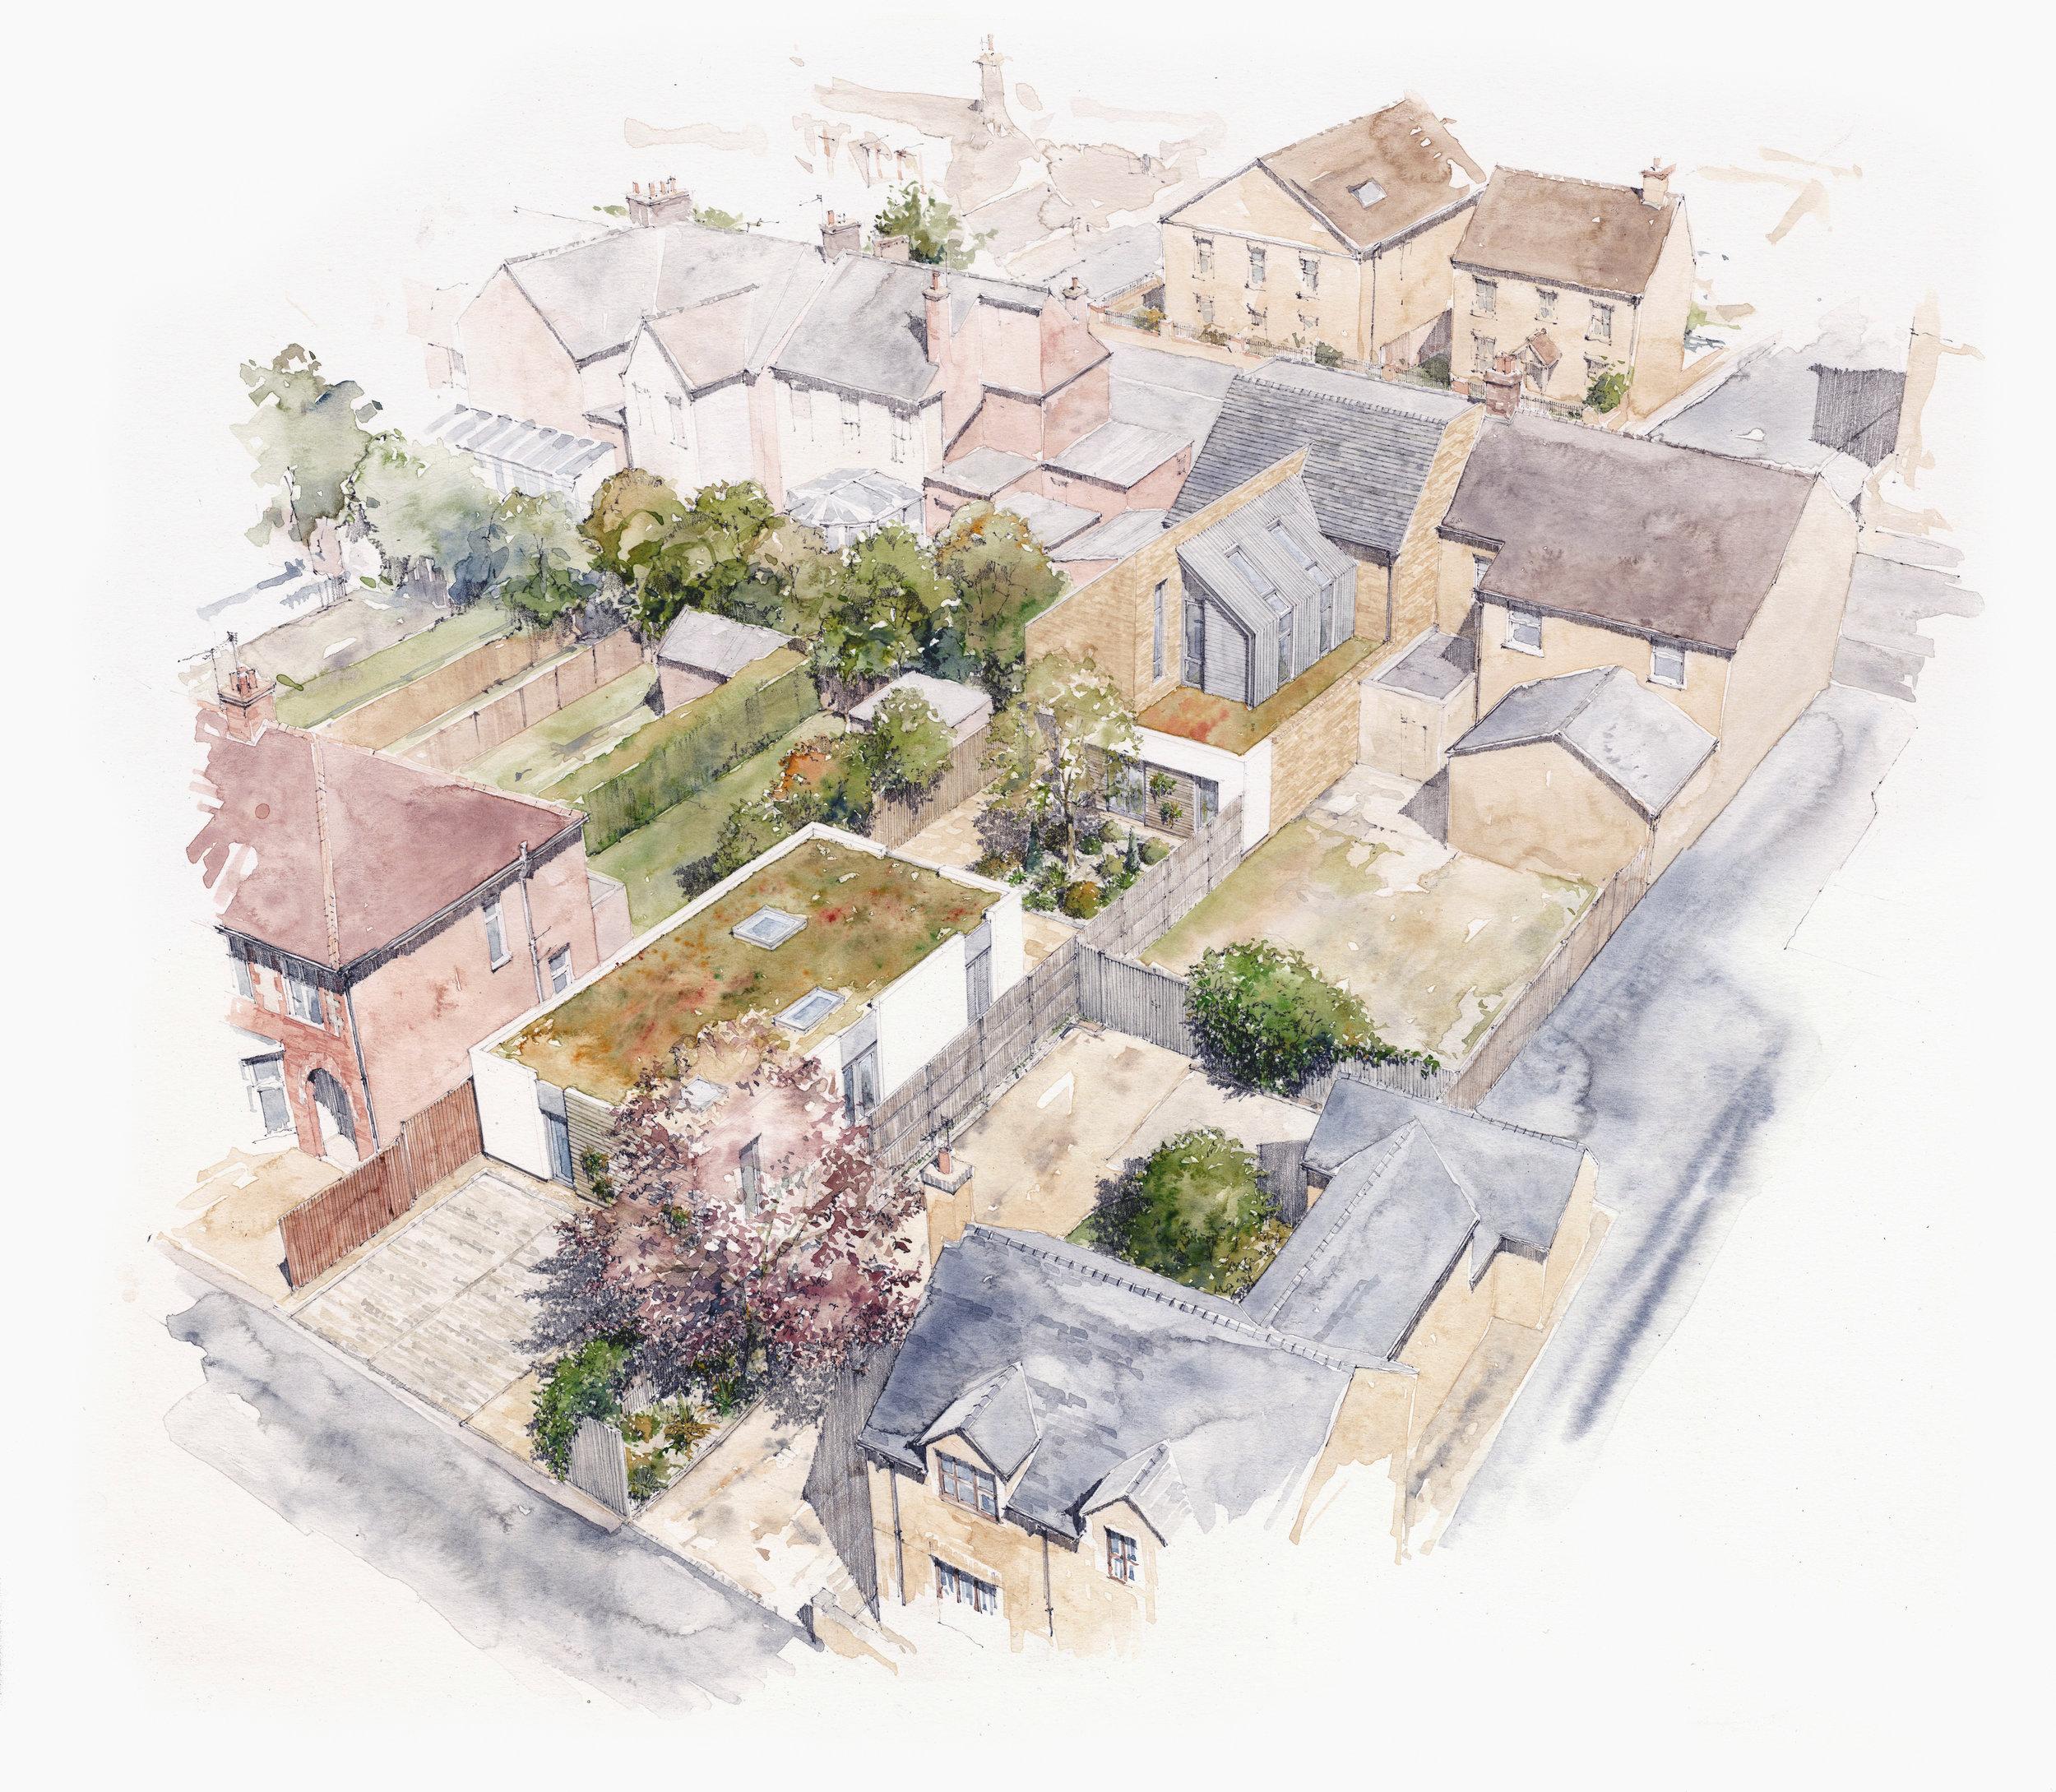 16215 53 High Street Eye aerial.jpg